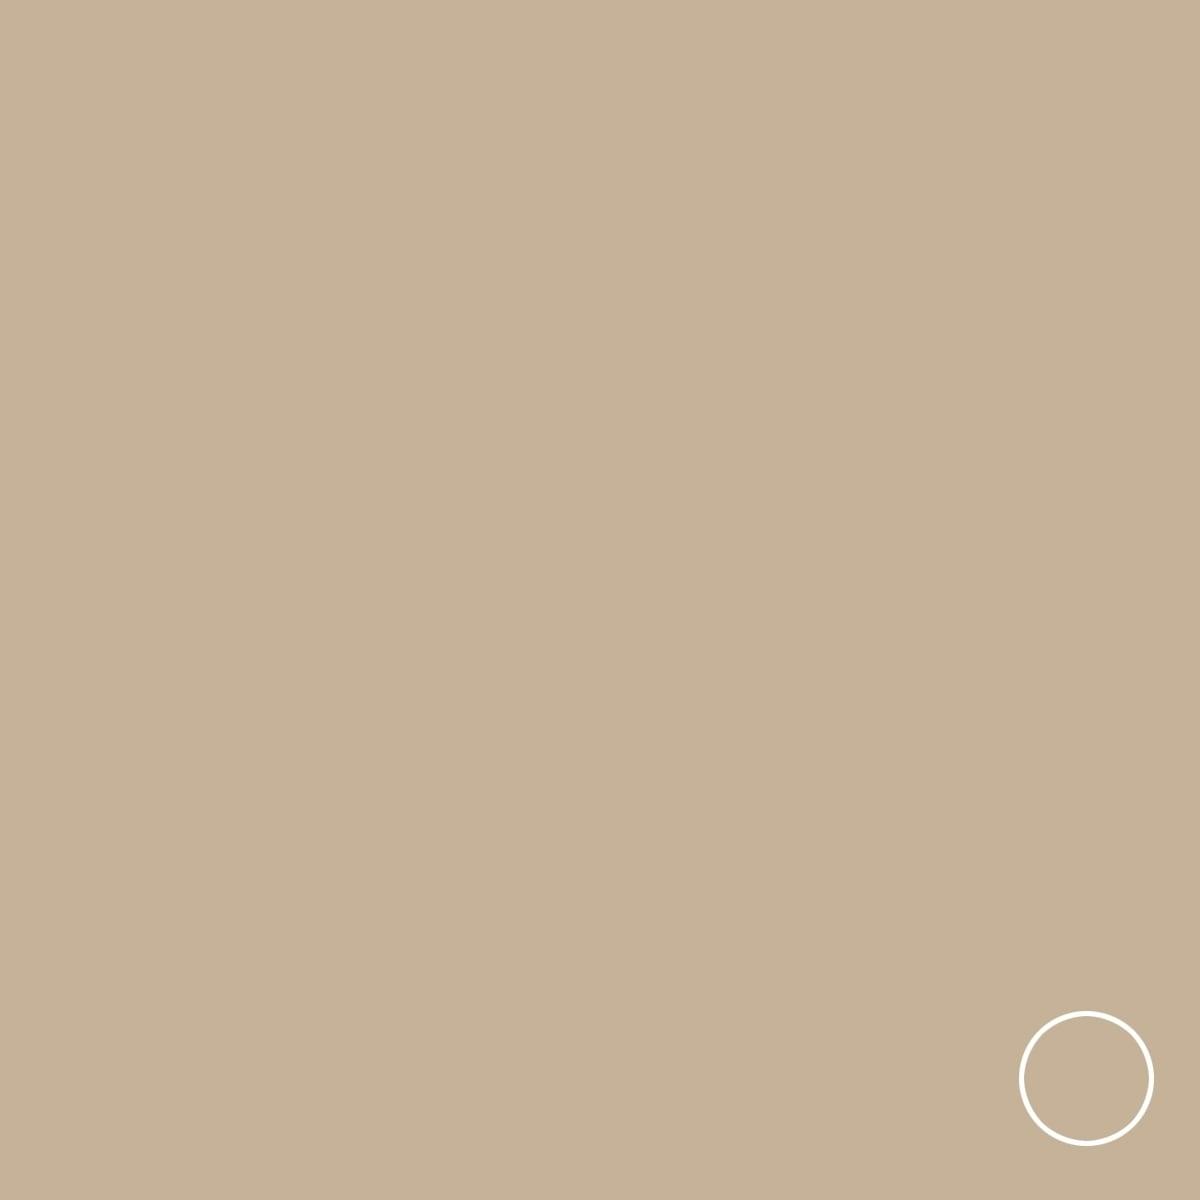 ORGANIC LINE (10ml) - PIGMENT CAMOUFLAGE 30 ORGANICLINE AMIEA (10 ml)